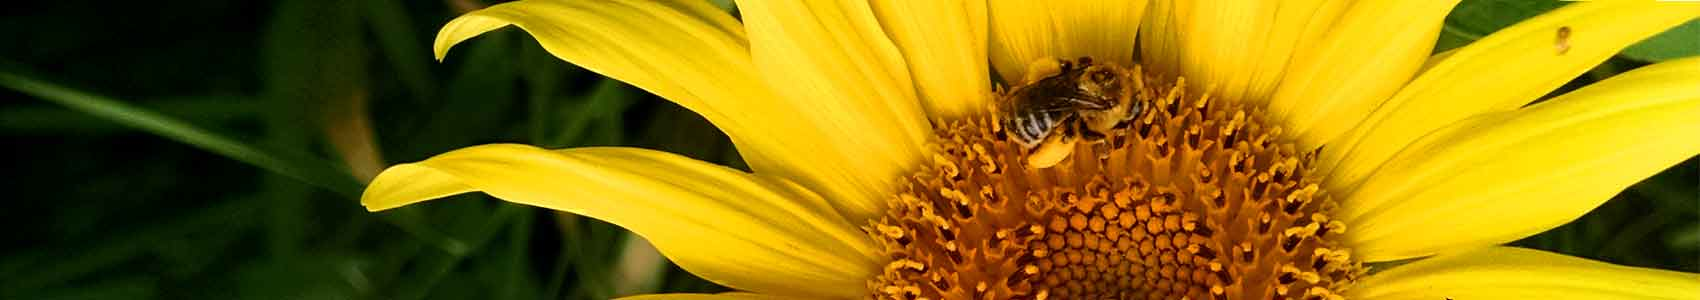 sunflowerbee1700X300